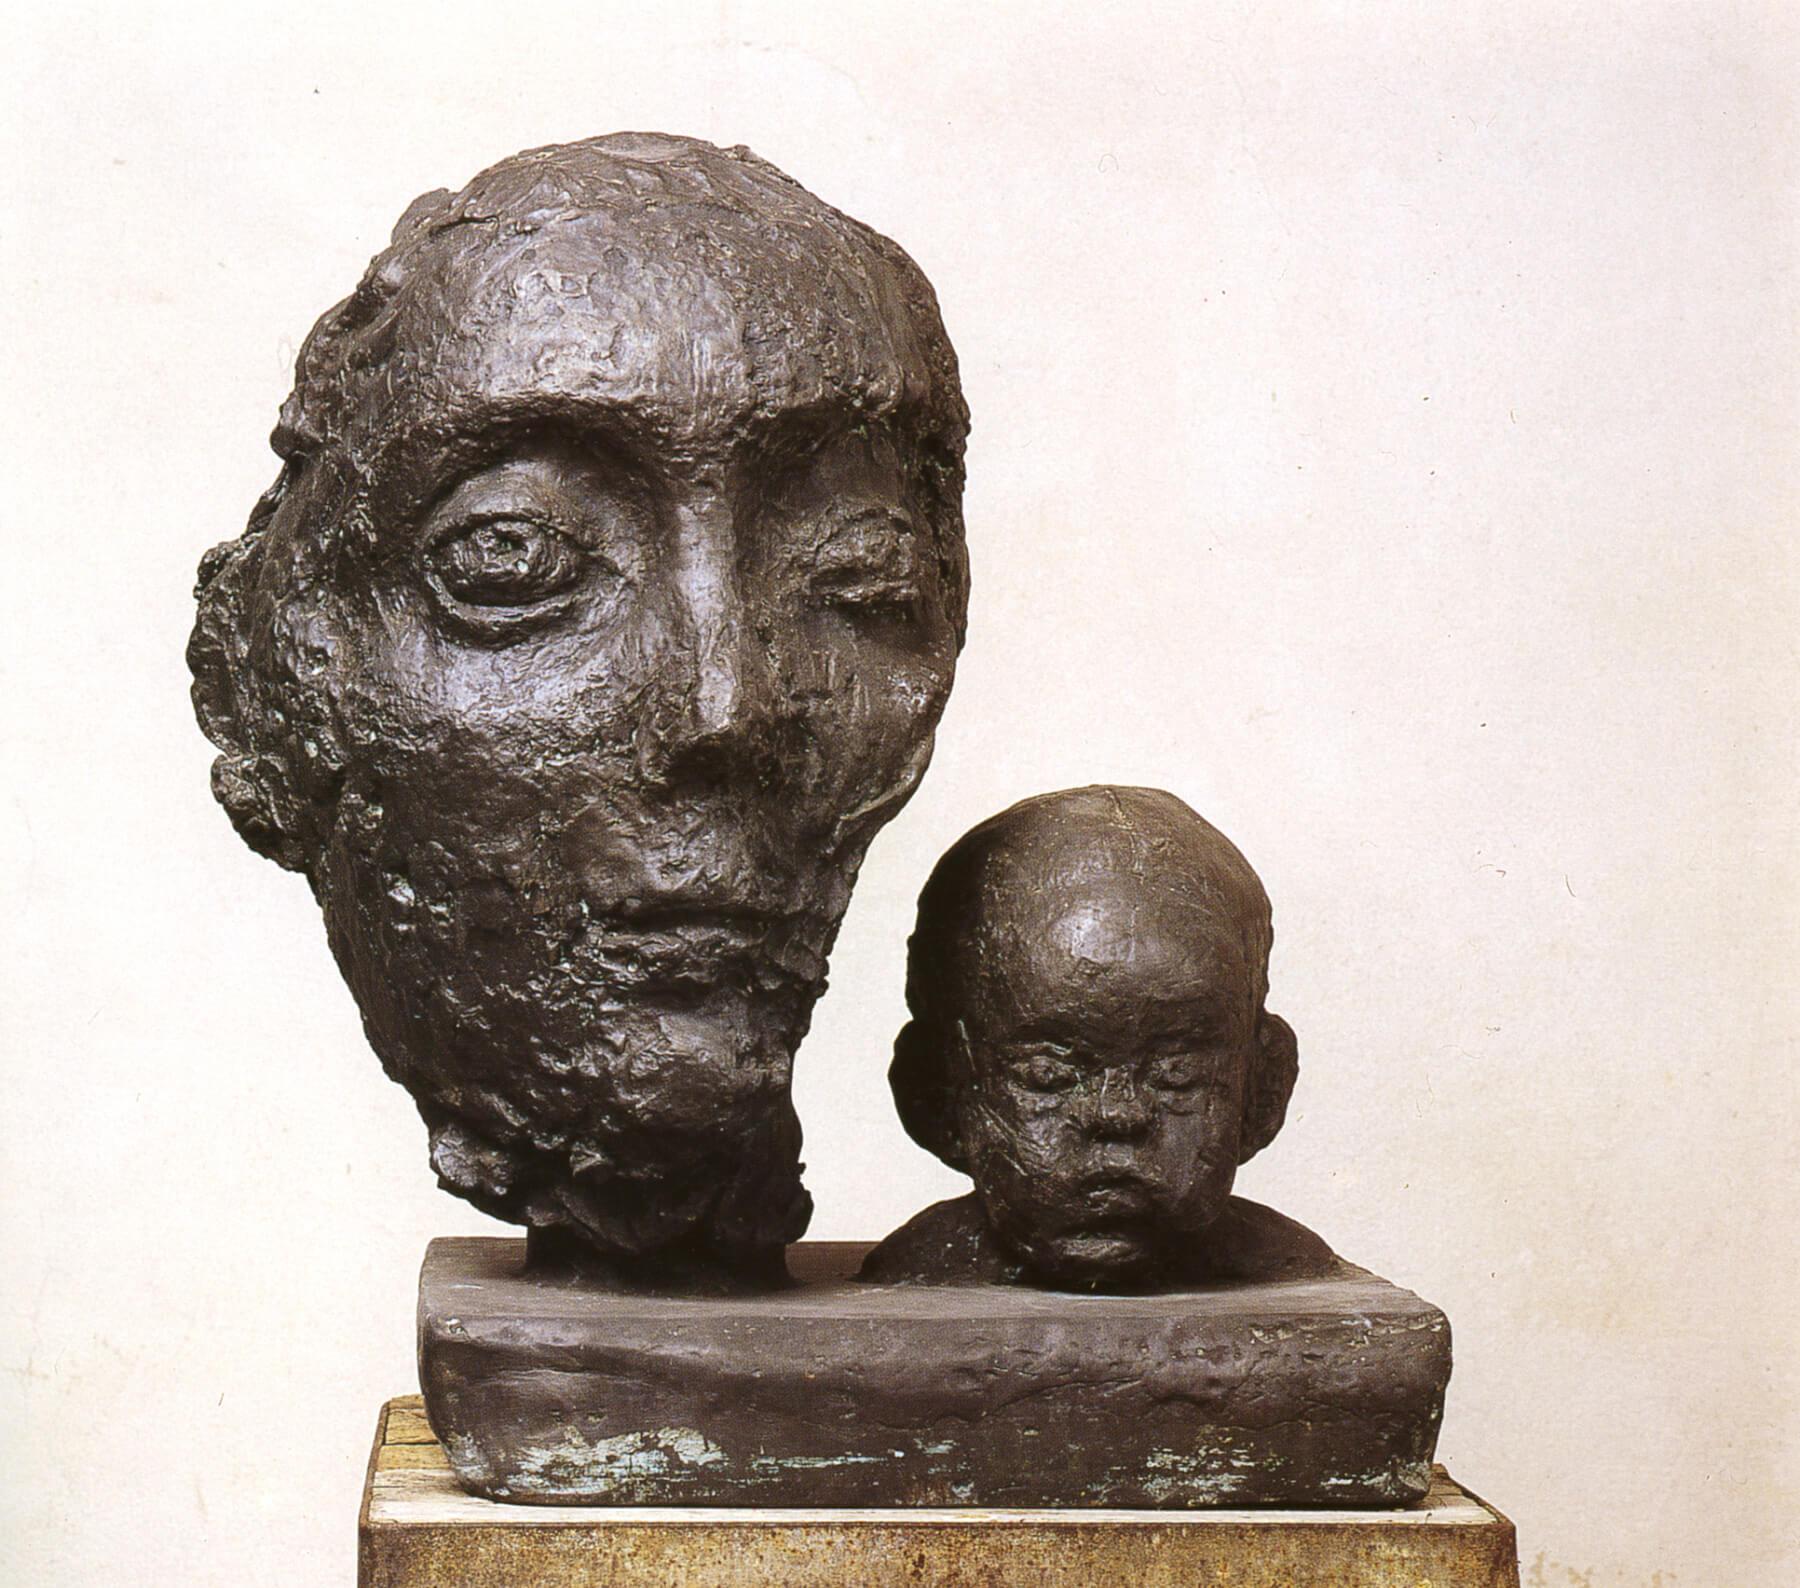 Sabina Grzimek, Doppelporträt, 1974/1976, Bronze, 51 x 44 cm